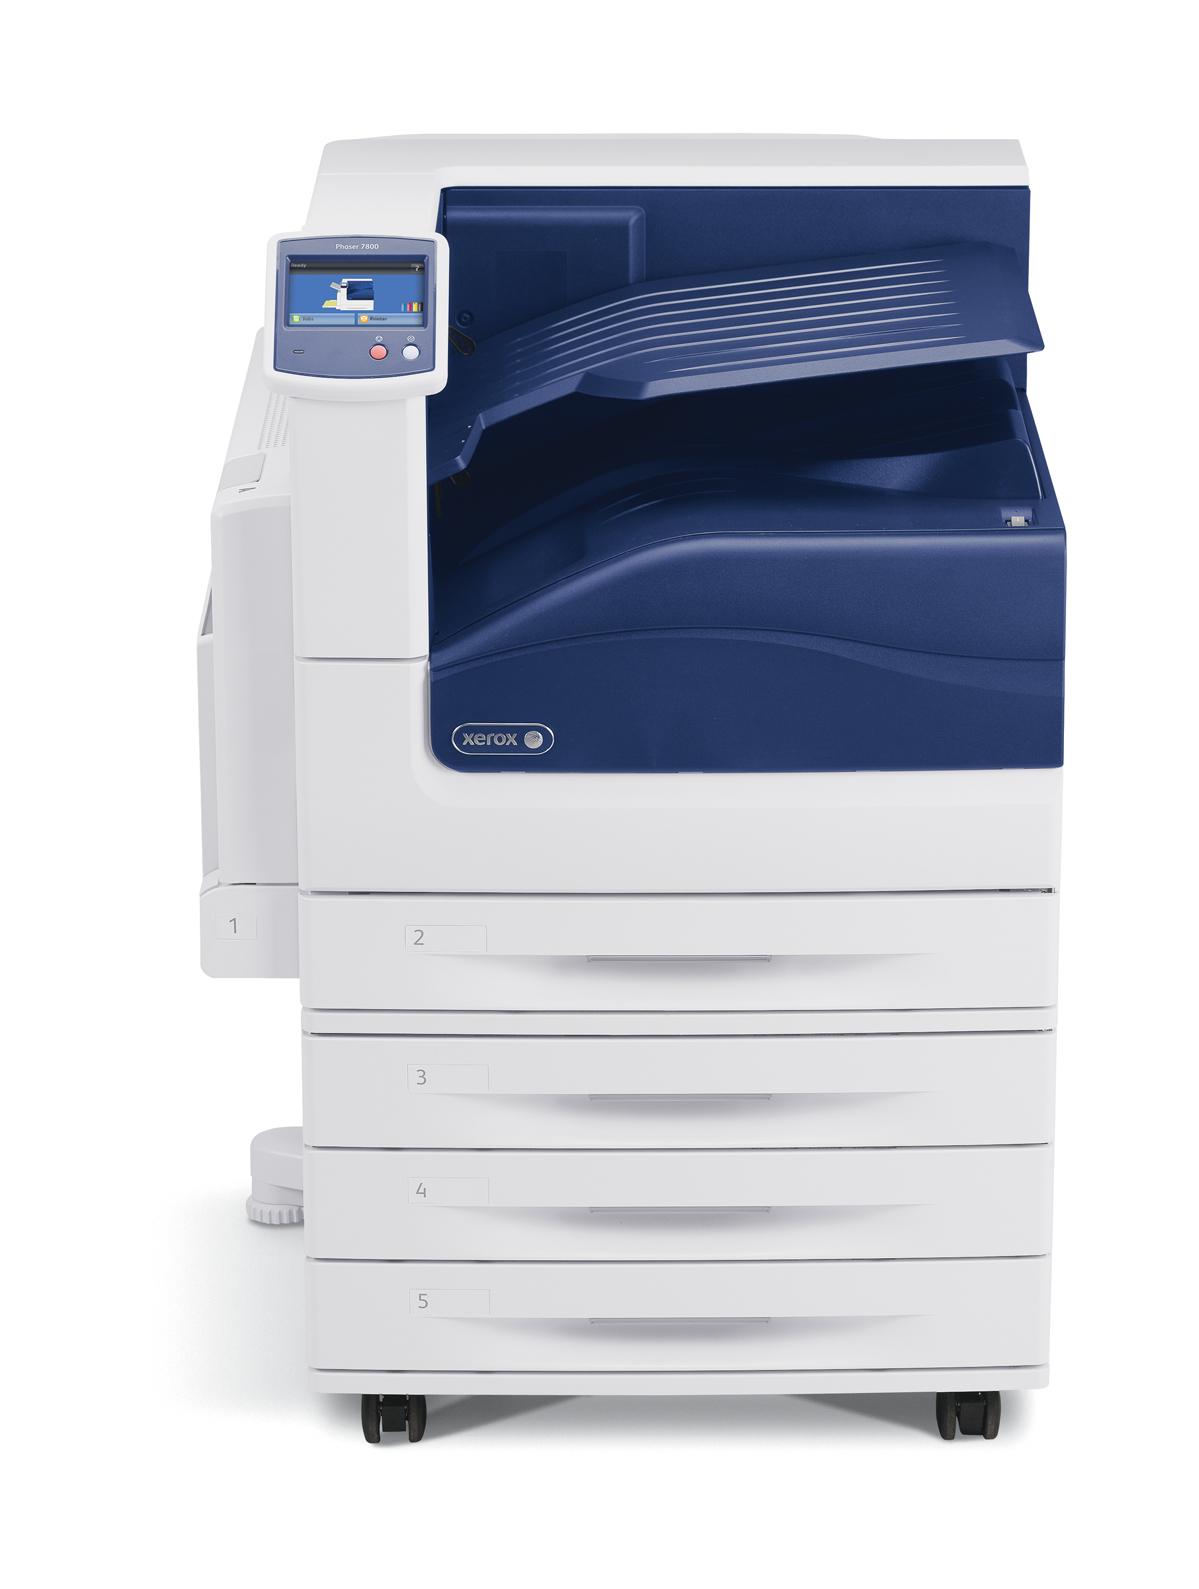 Xerox 7800V_GX Colour 1200 x 2400DPI A3 laser printer